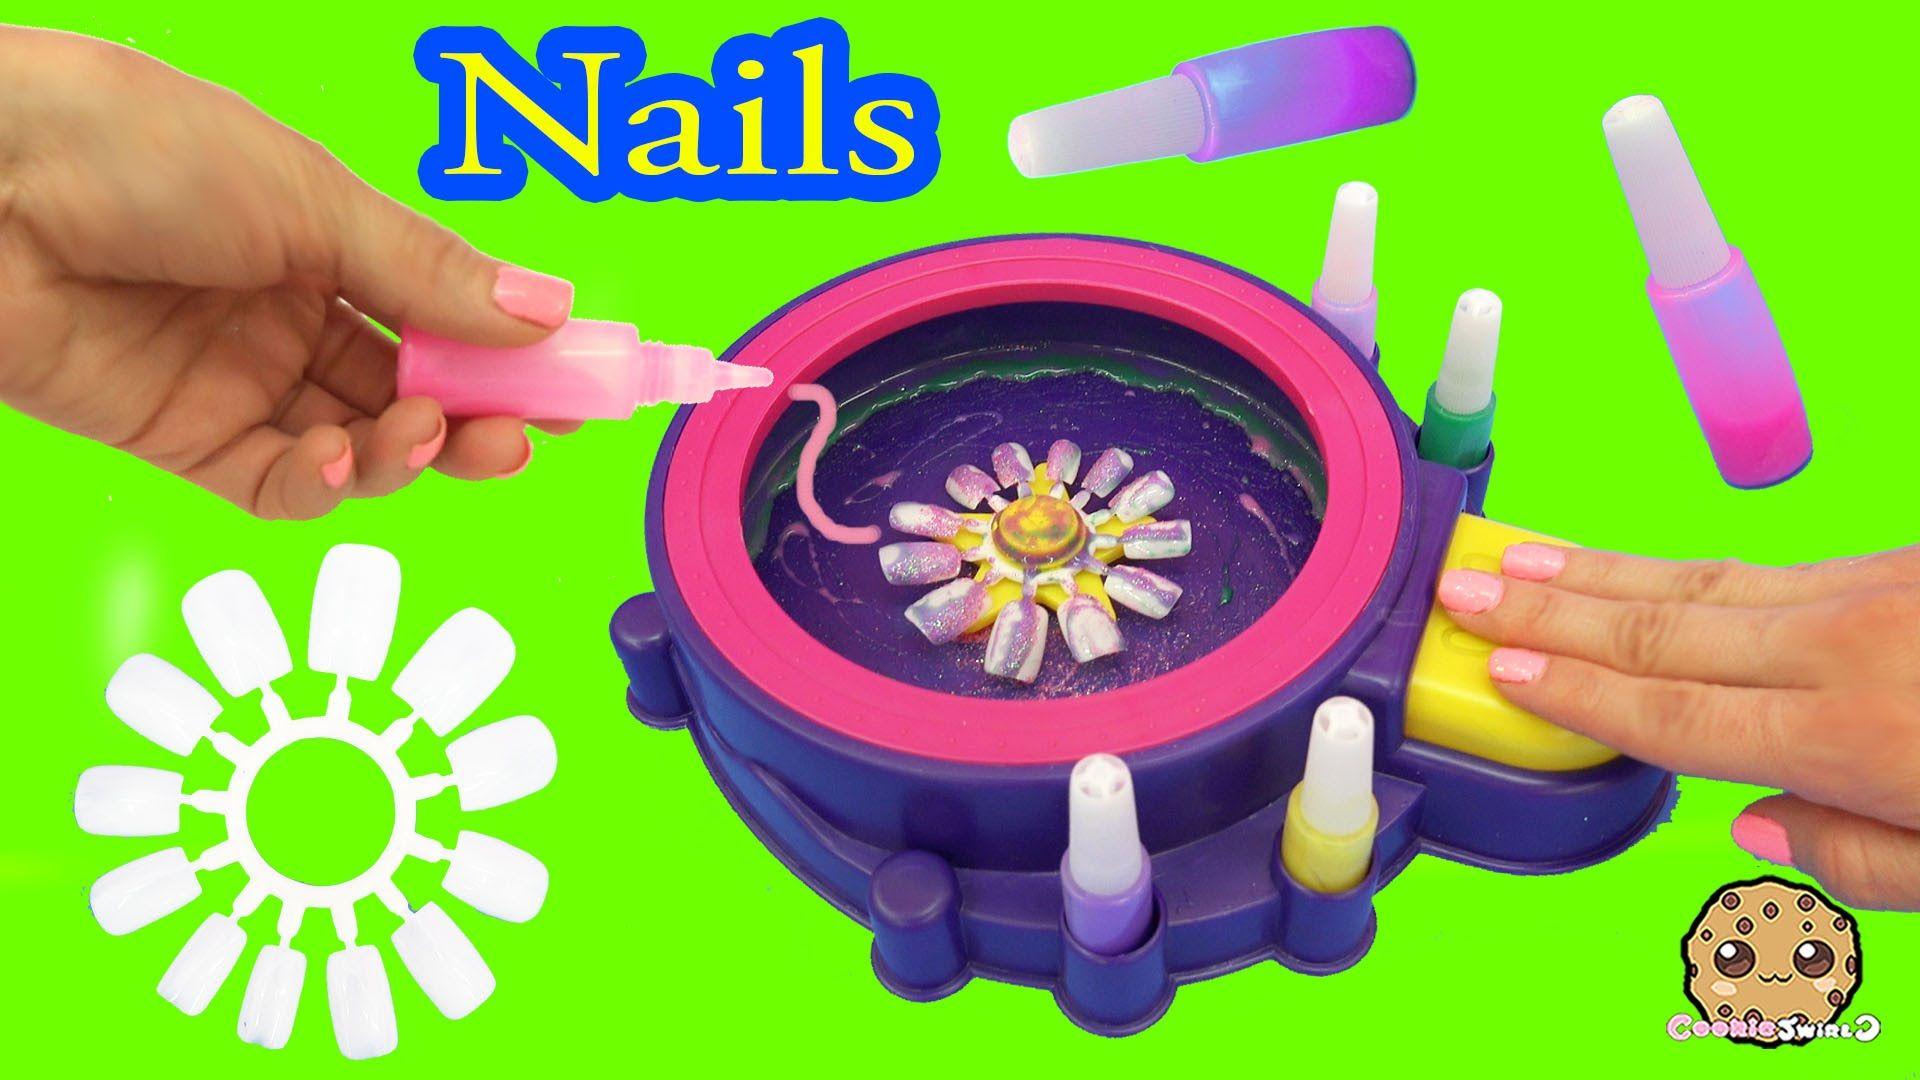 Fail - Make Your Own Custom Nails with Glitter Nail Swirl Art Kit ...